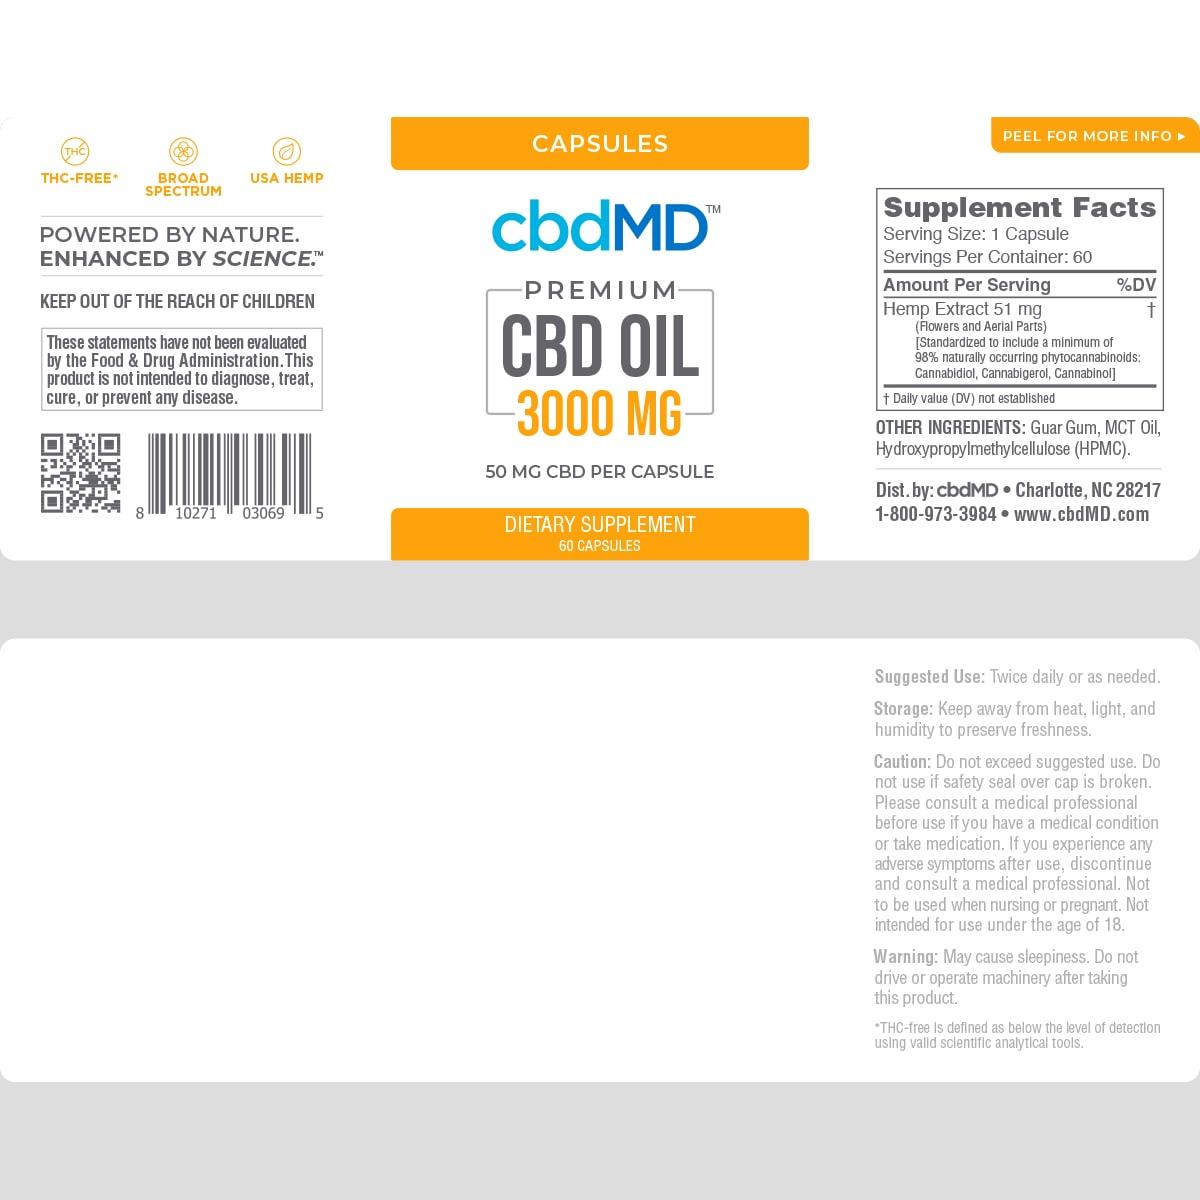 cbdMD, CBD Oil Capsules, Broad Spectrum THC-Free, 60-Count, 3000mg of CBD 3